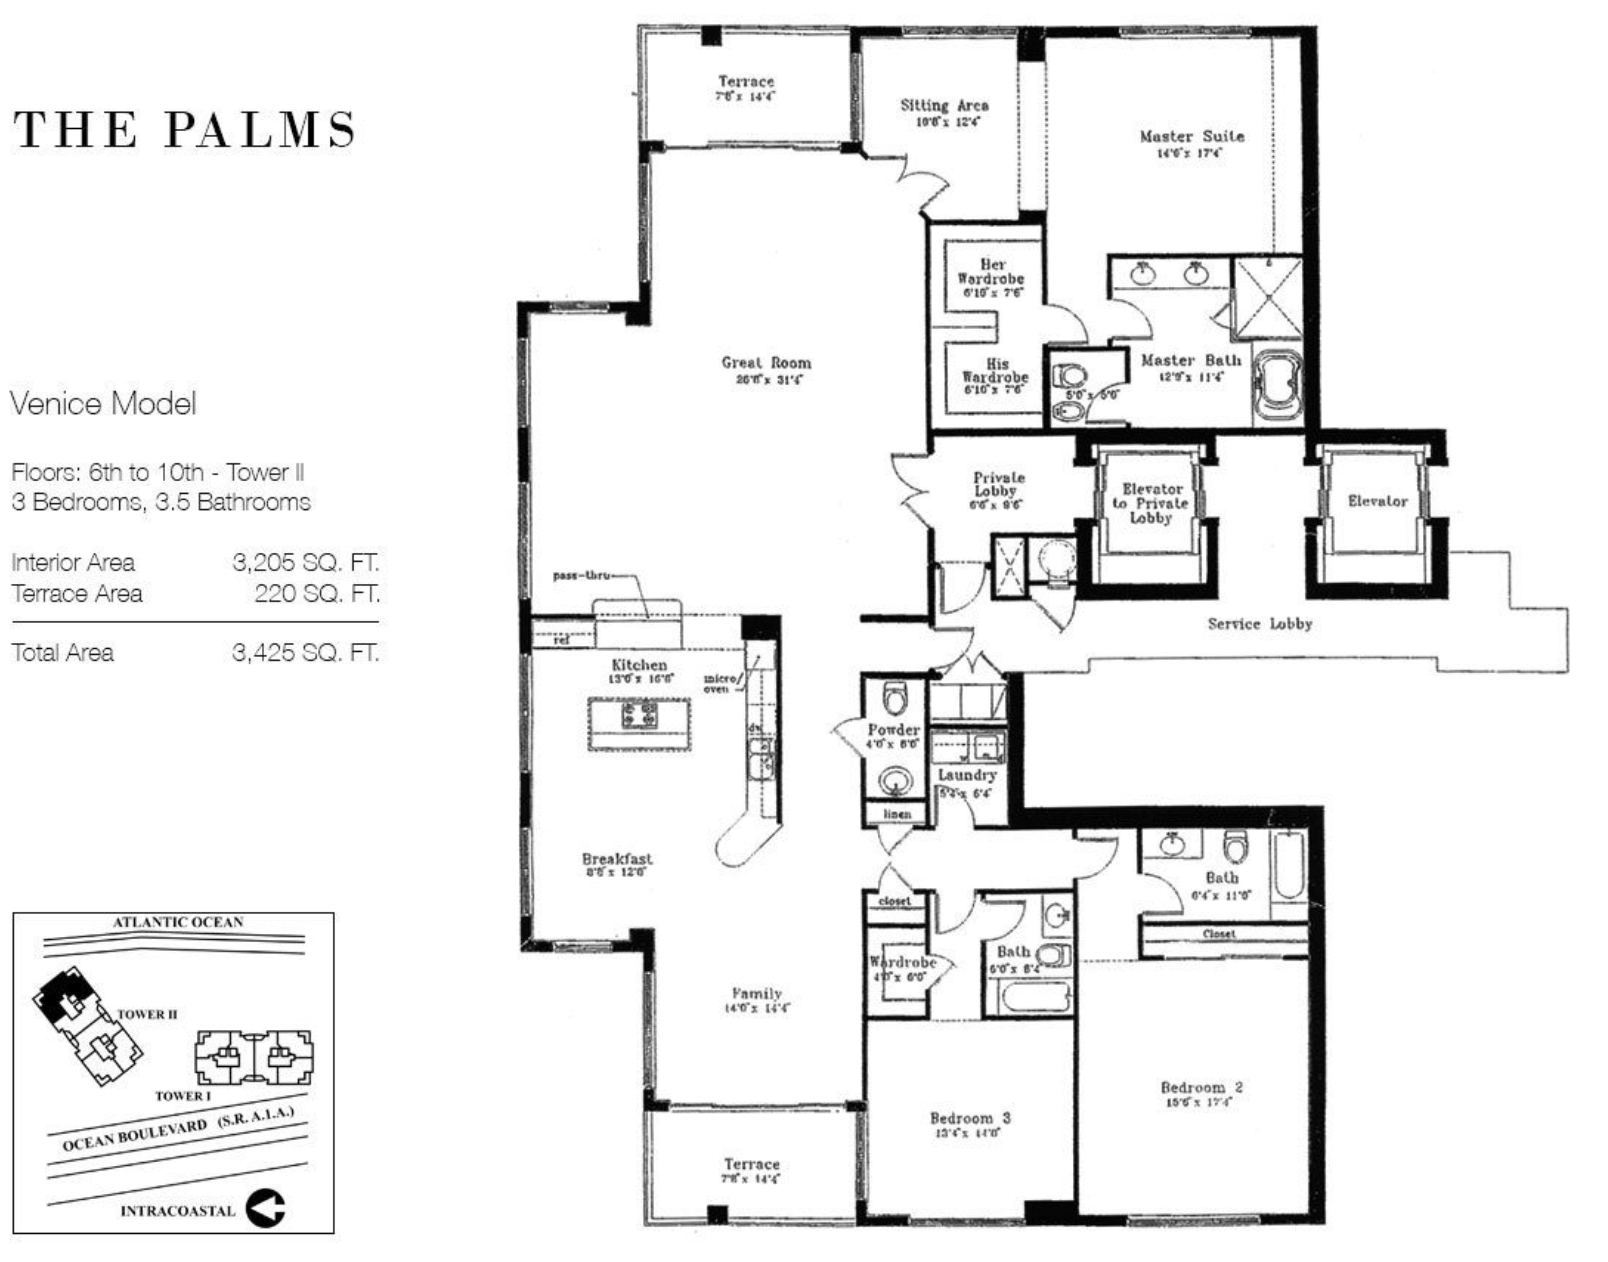 The Palms Fort Lauderdale | Floor Plan Venice